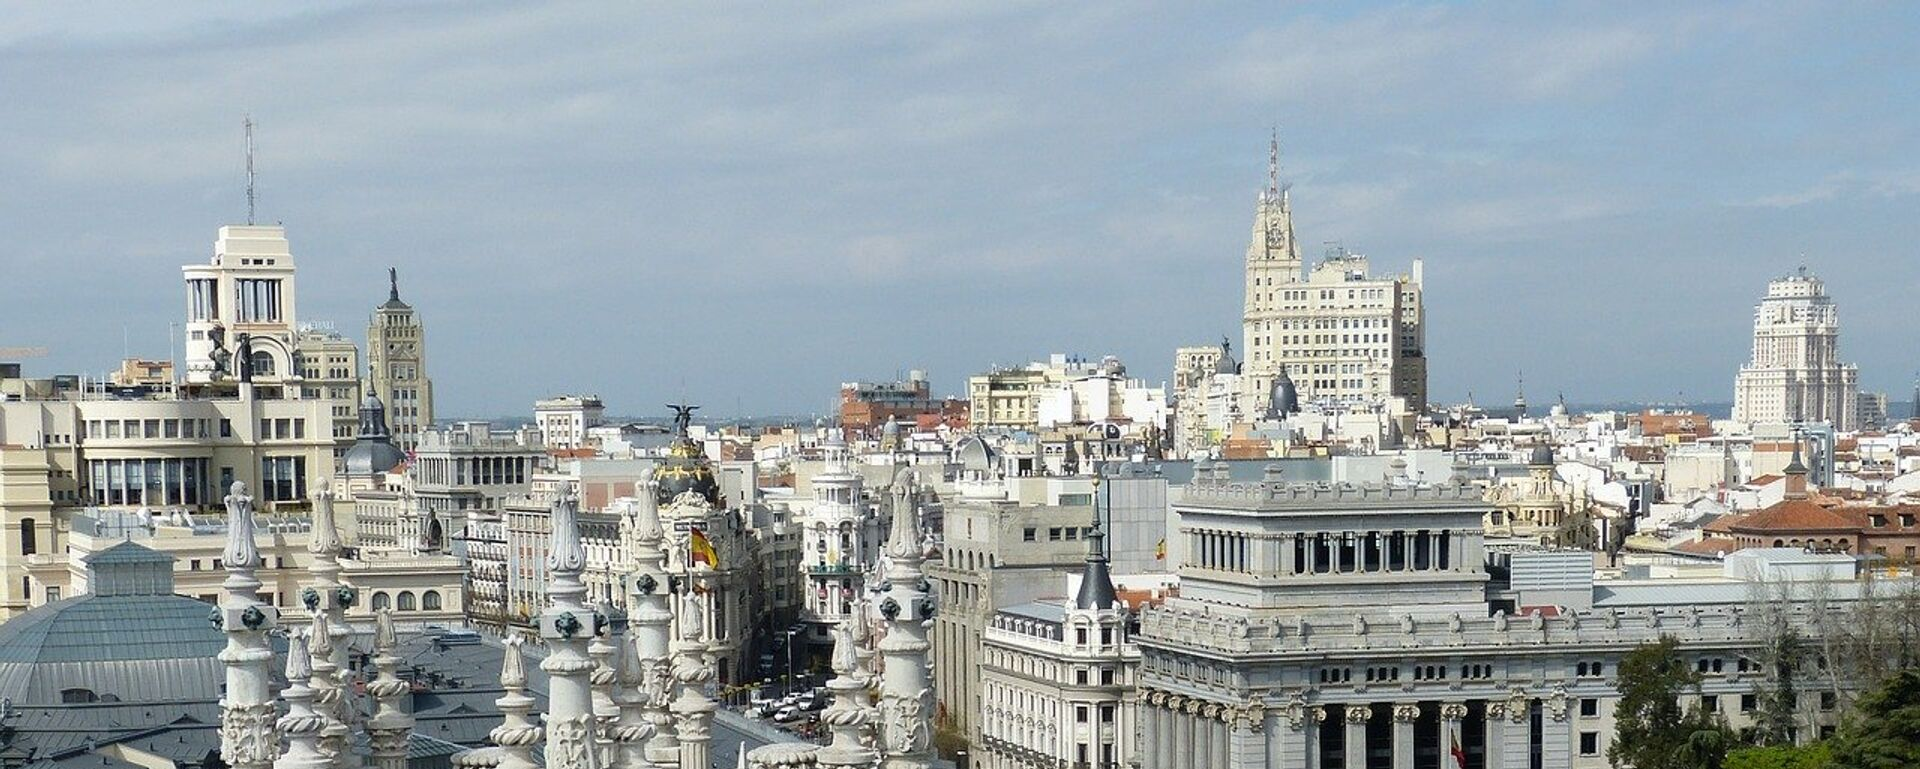 El centro de Madrid, referencial - Sputnik Mundo, 1920, 02.10.2020